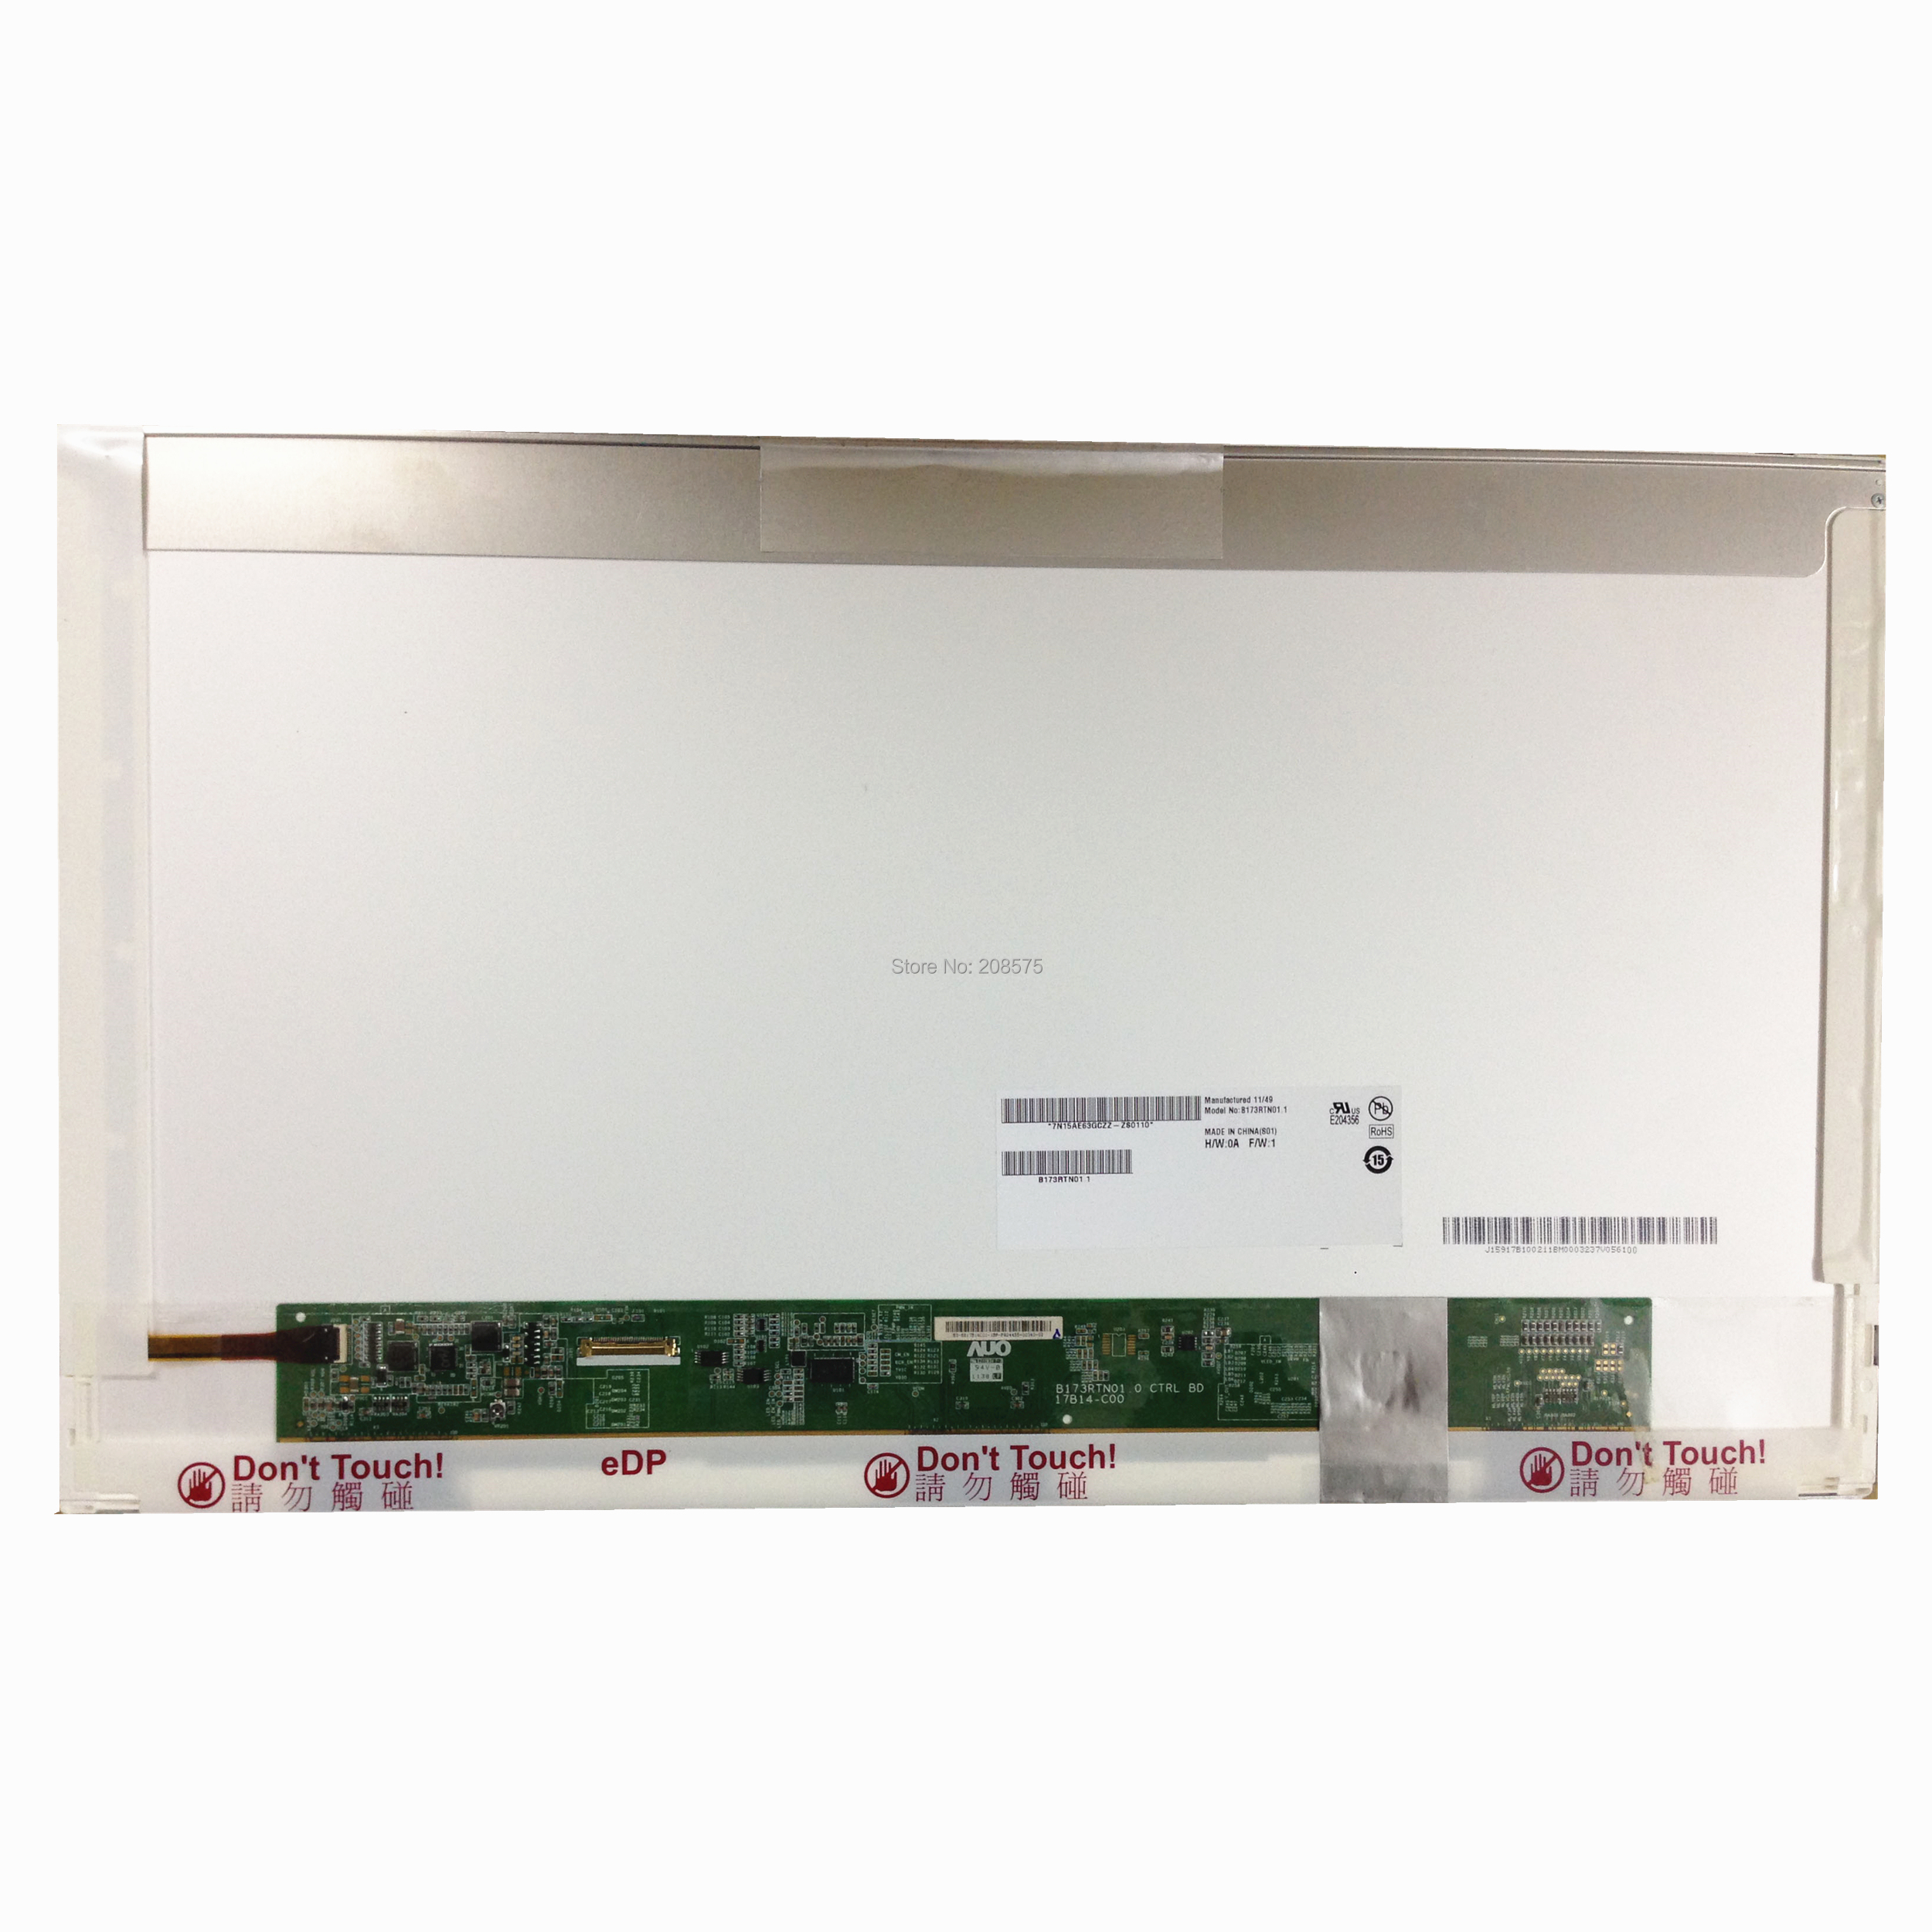 Free shipping B173RTN01.1 B173RTN01.3 N173FGE-E23 LP173WD1-TPE1 For Acer V3-772 LCD Laptop screen  30 pinsFree shipping B173RTN01.1 B173RTN01.3 N173FGE-E23 LP173WD1-TPE1 For Acer V3-772 LCD Laptop screen  30 pins